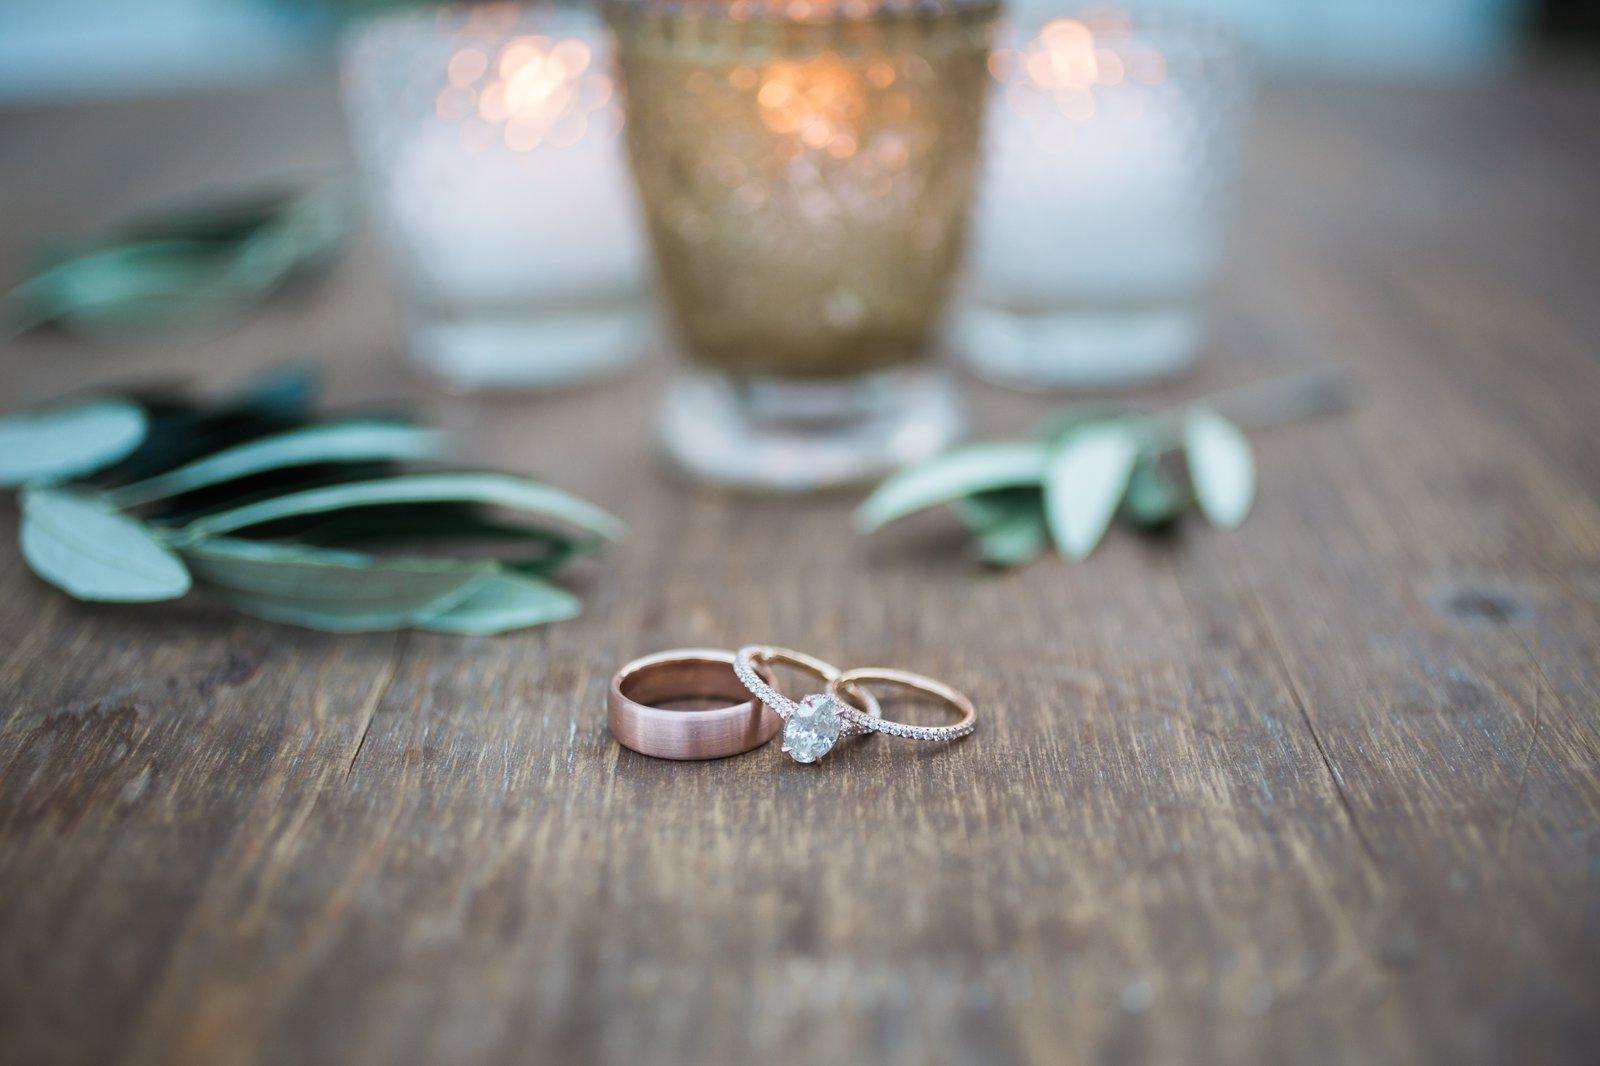 Rose gold wedding rings for this Santa Barbara Riviera Wedding.